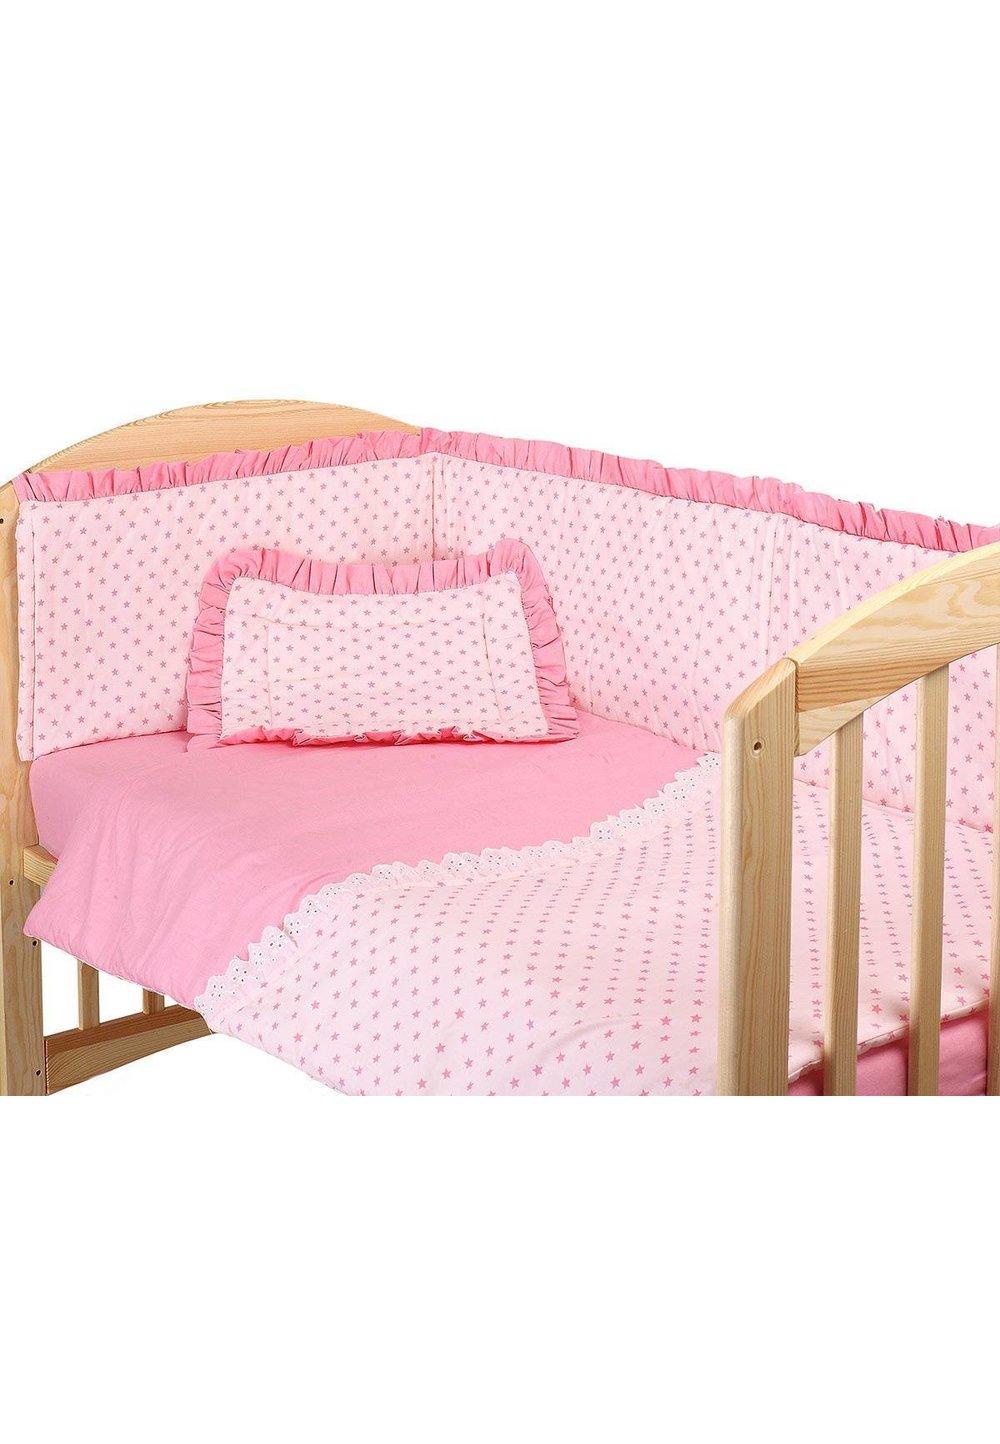 Lenjerie patut, roz cu stelute roz, 3 piese, 120x60cm imagine